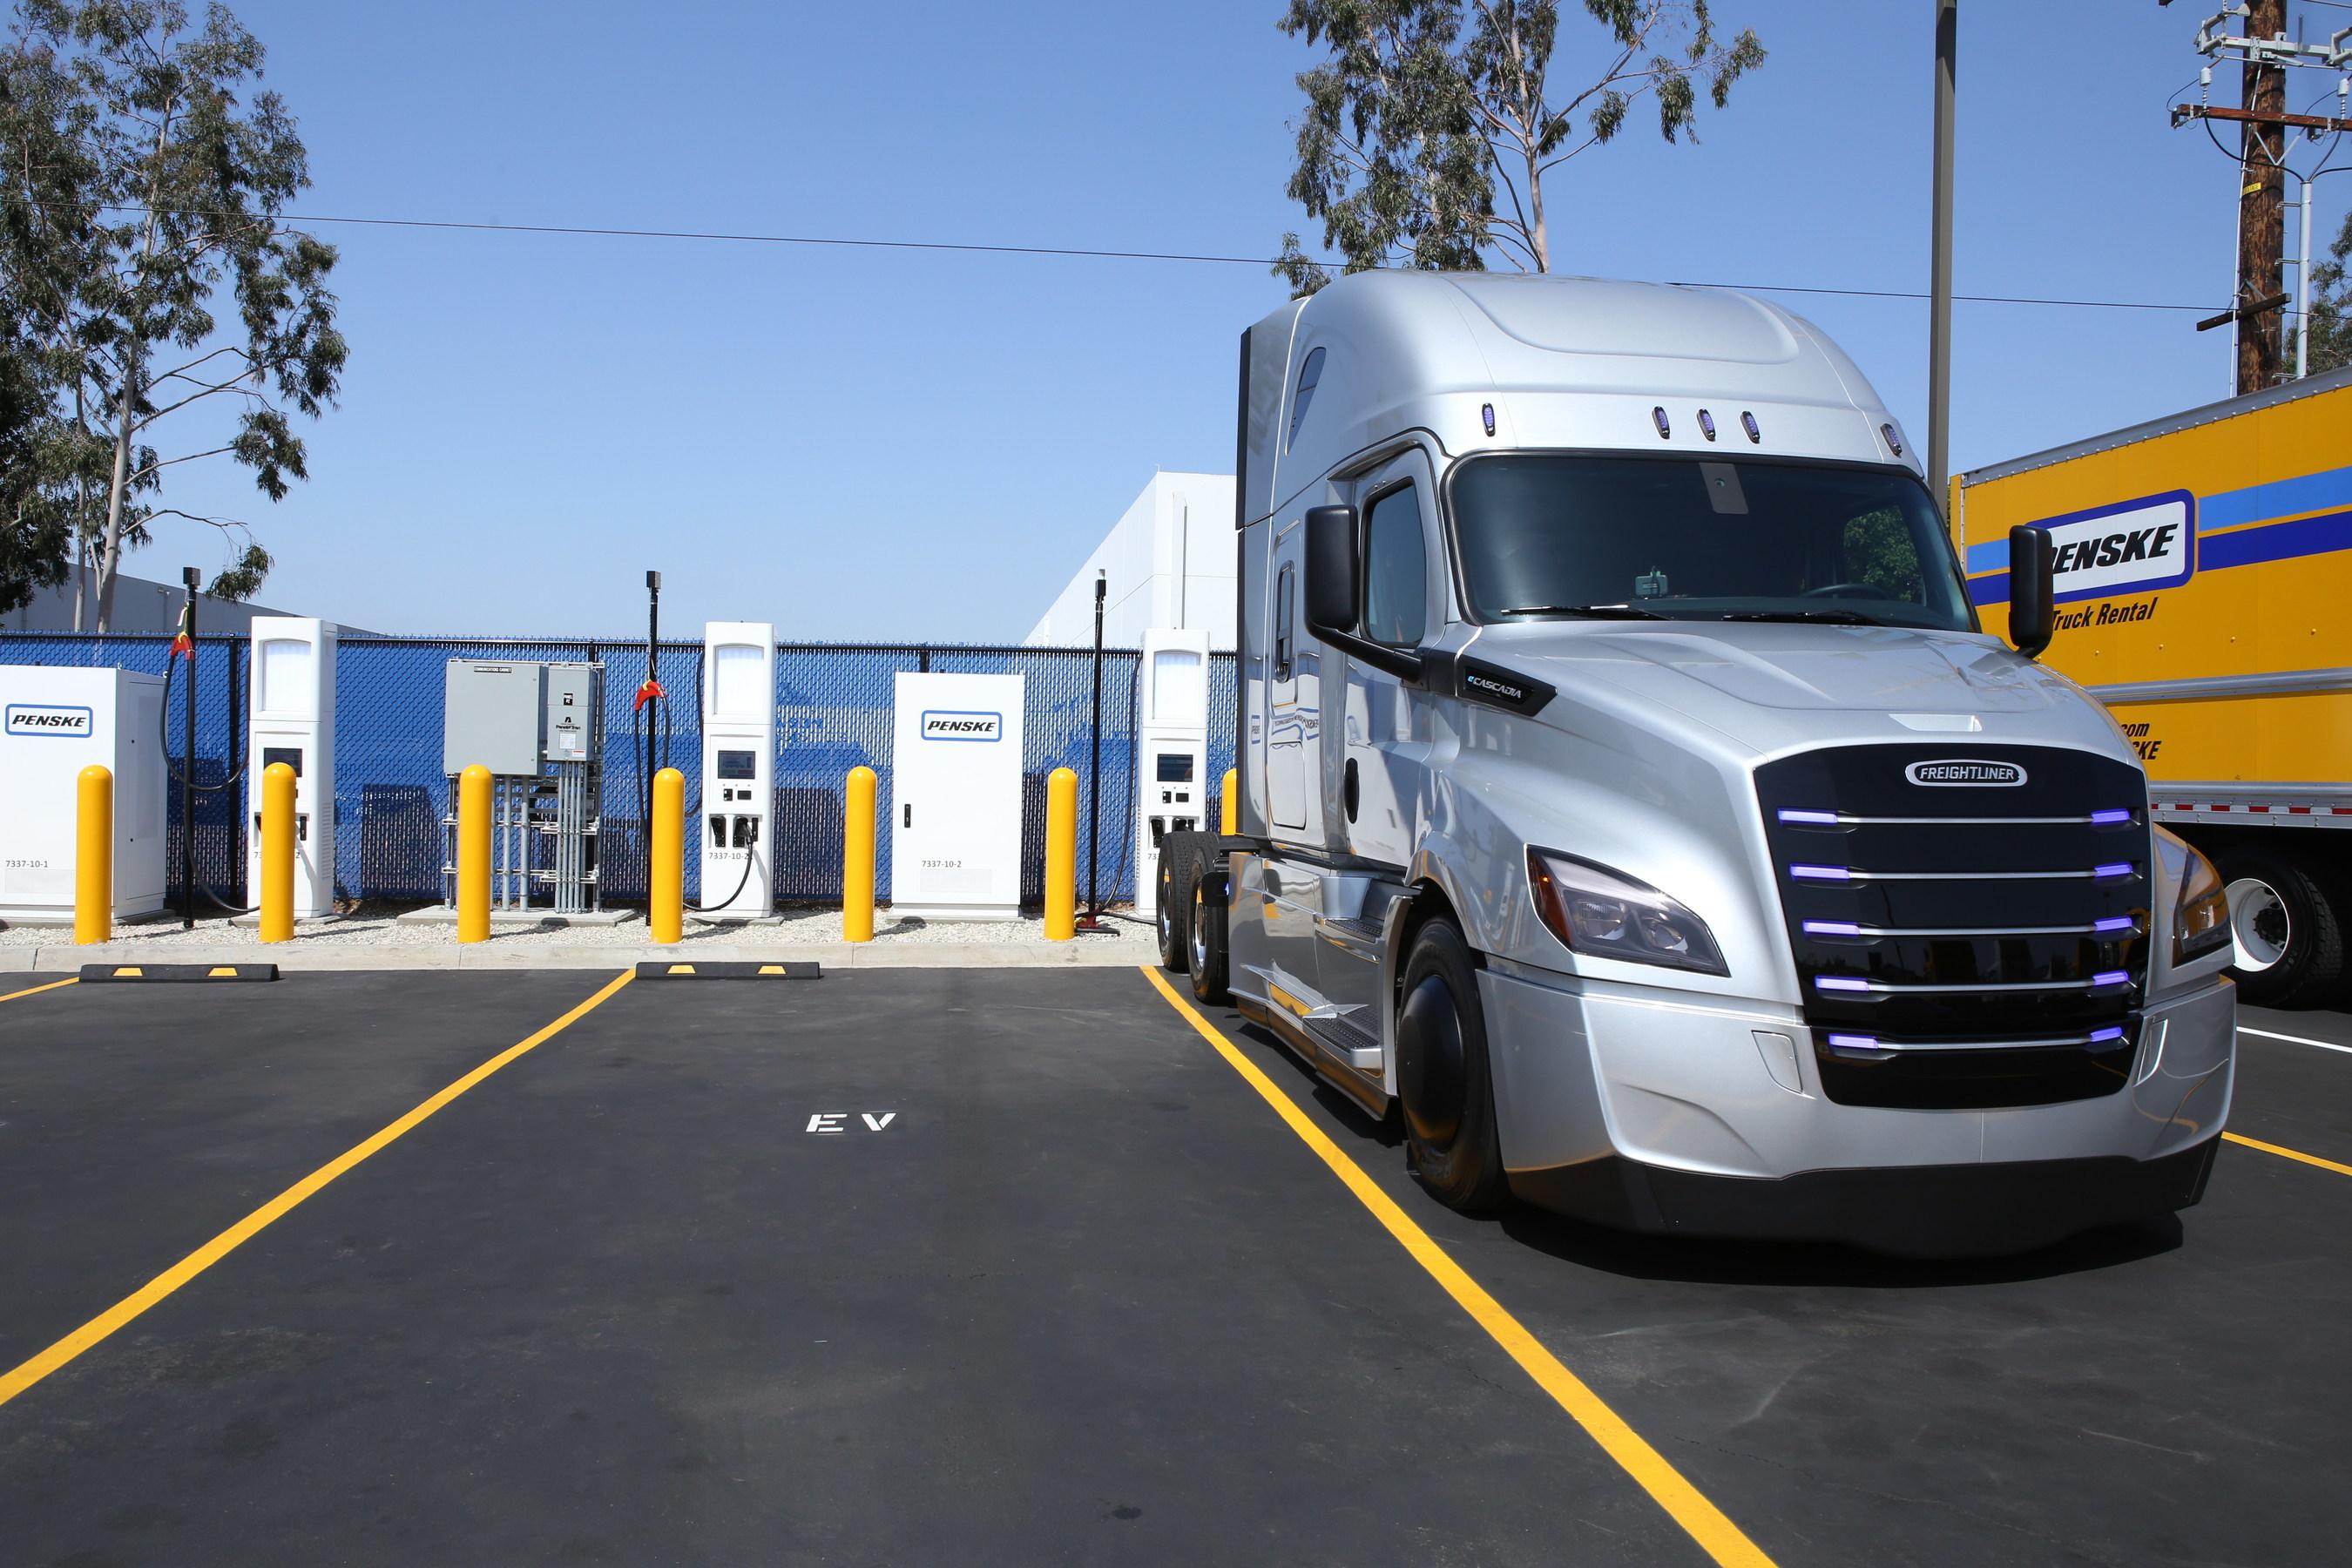 Penske Truck Leasing commercial heavy-duty electric vehicle charging station in La Mirada, CA.